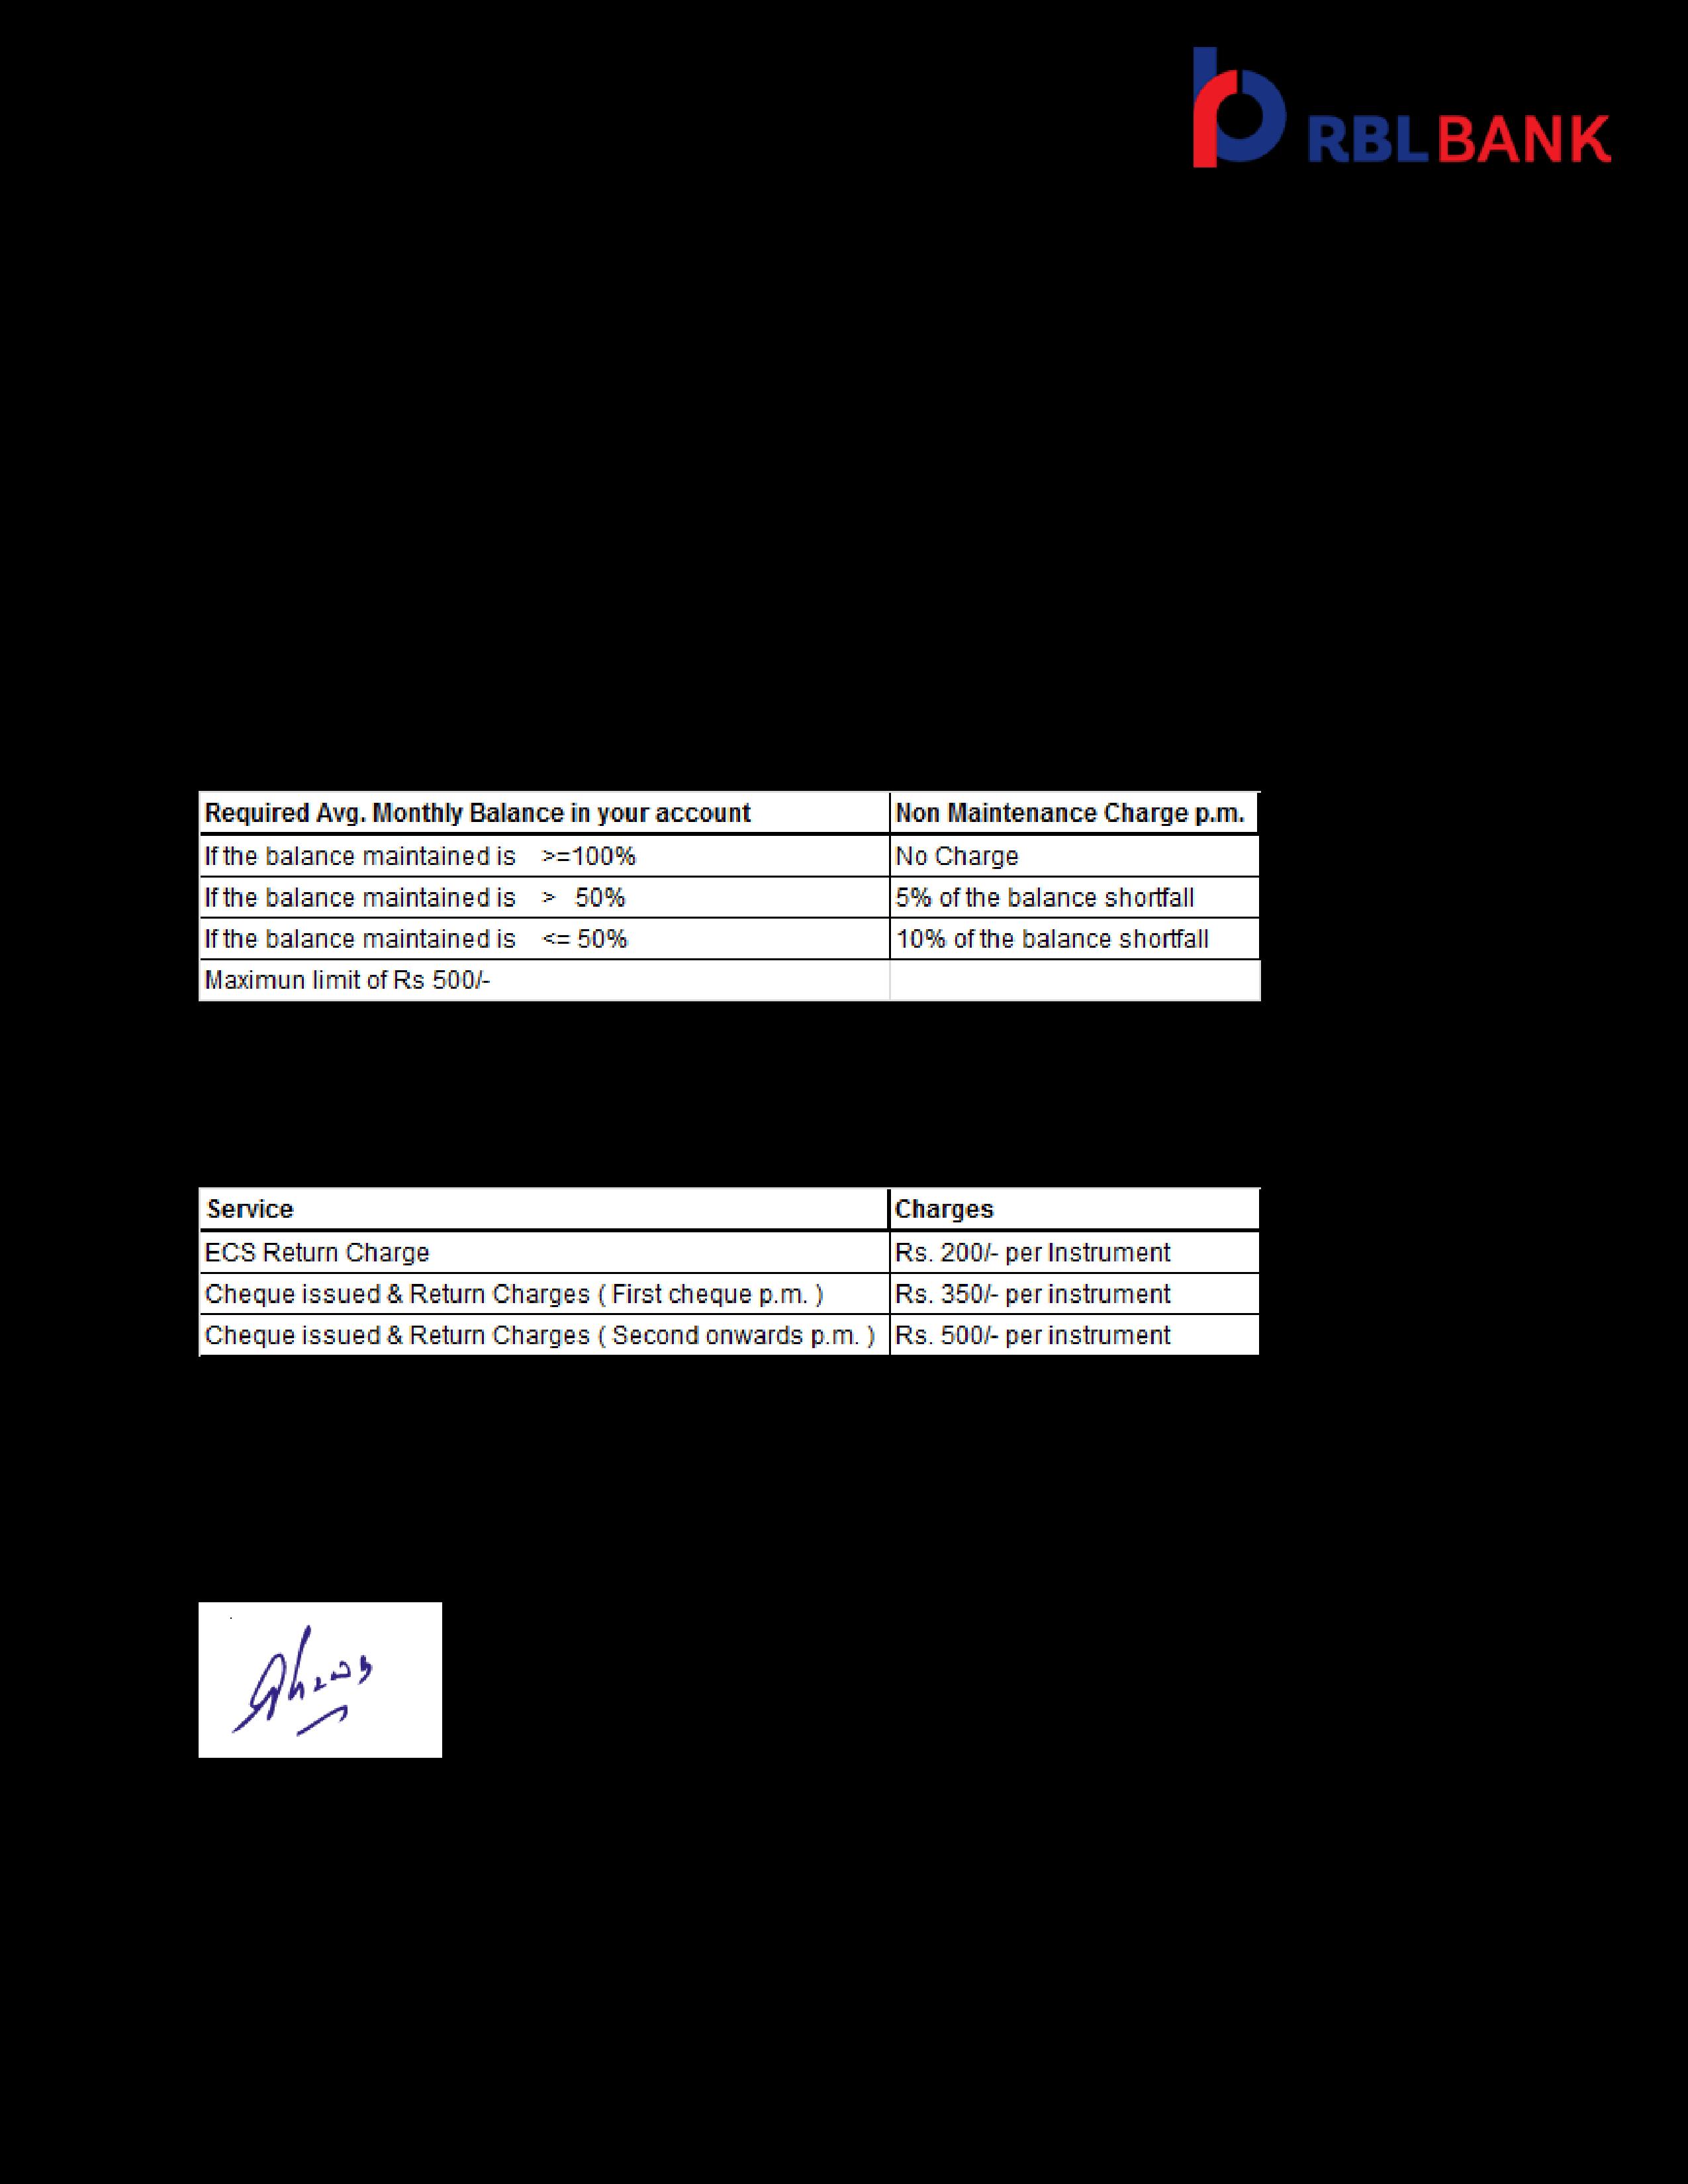 Dear Valued Customer Letter   Templates at allbusinesstemplates.com